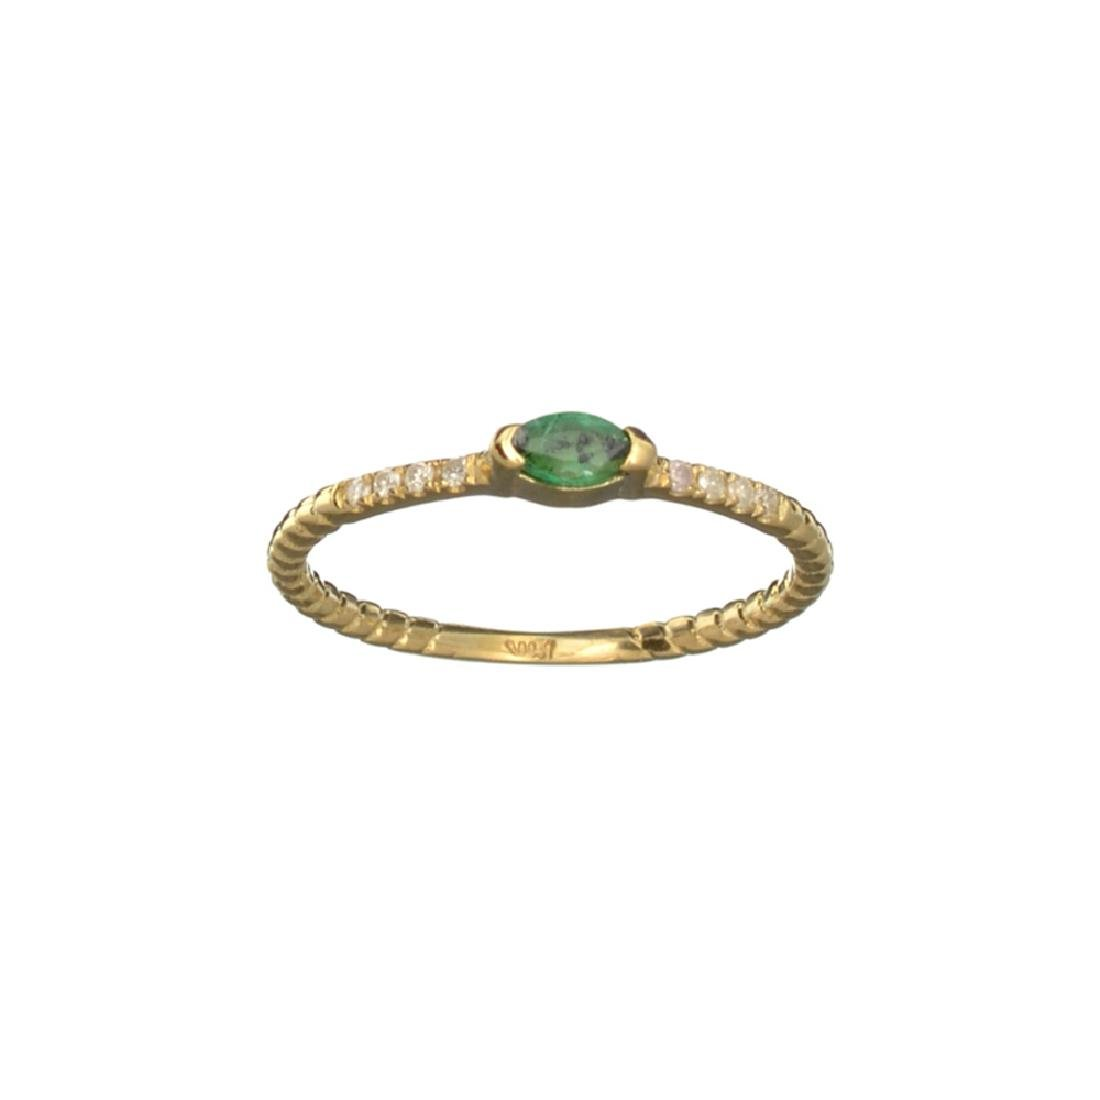 APP: 0.6k Fine Jewelry 14 KT Gold, 0.15CT Green Emerald